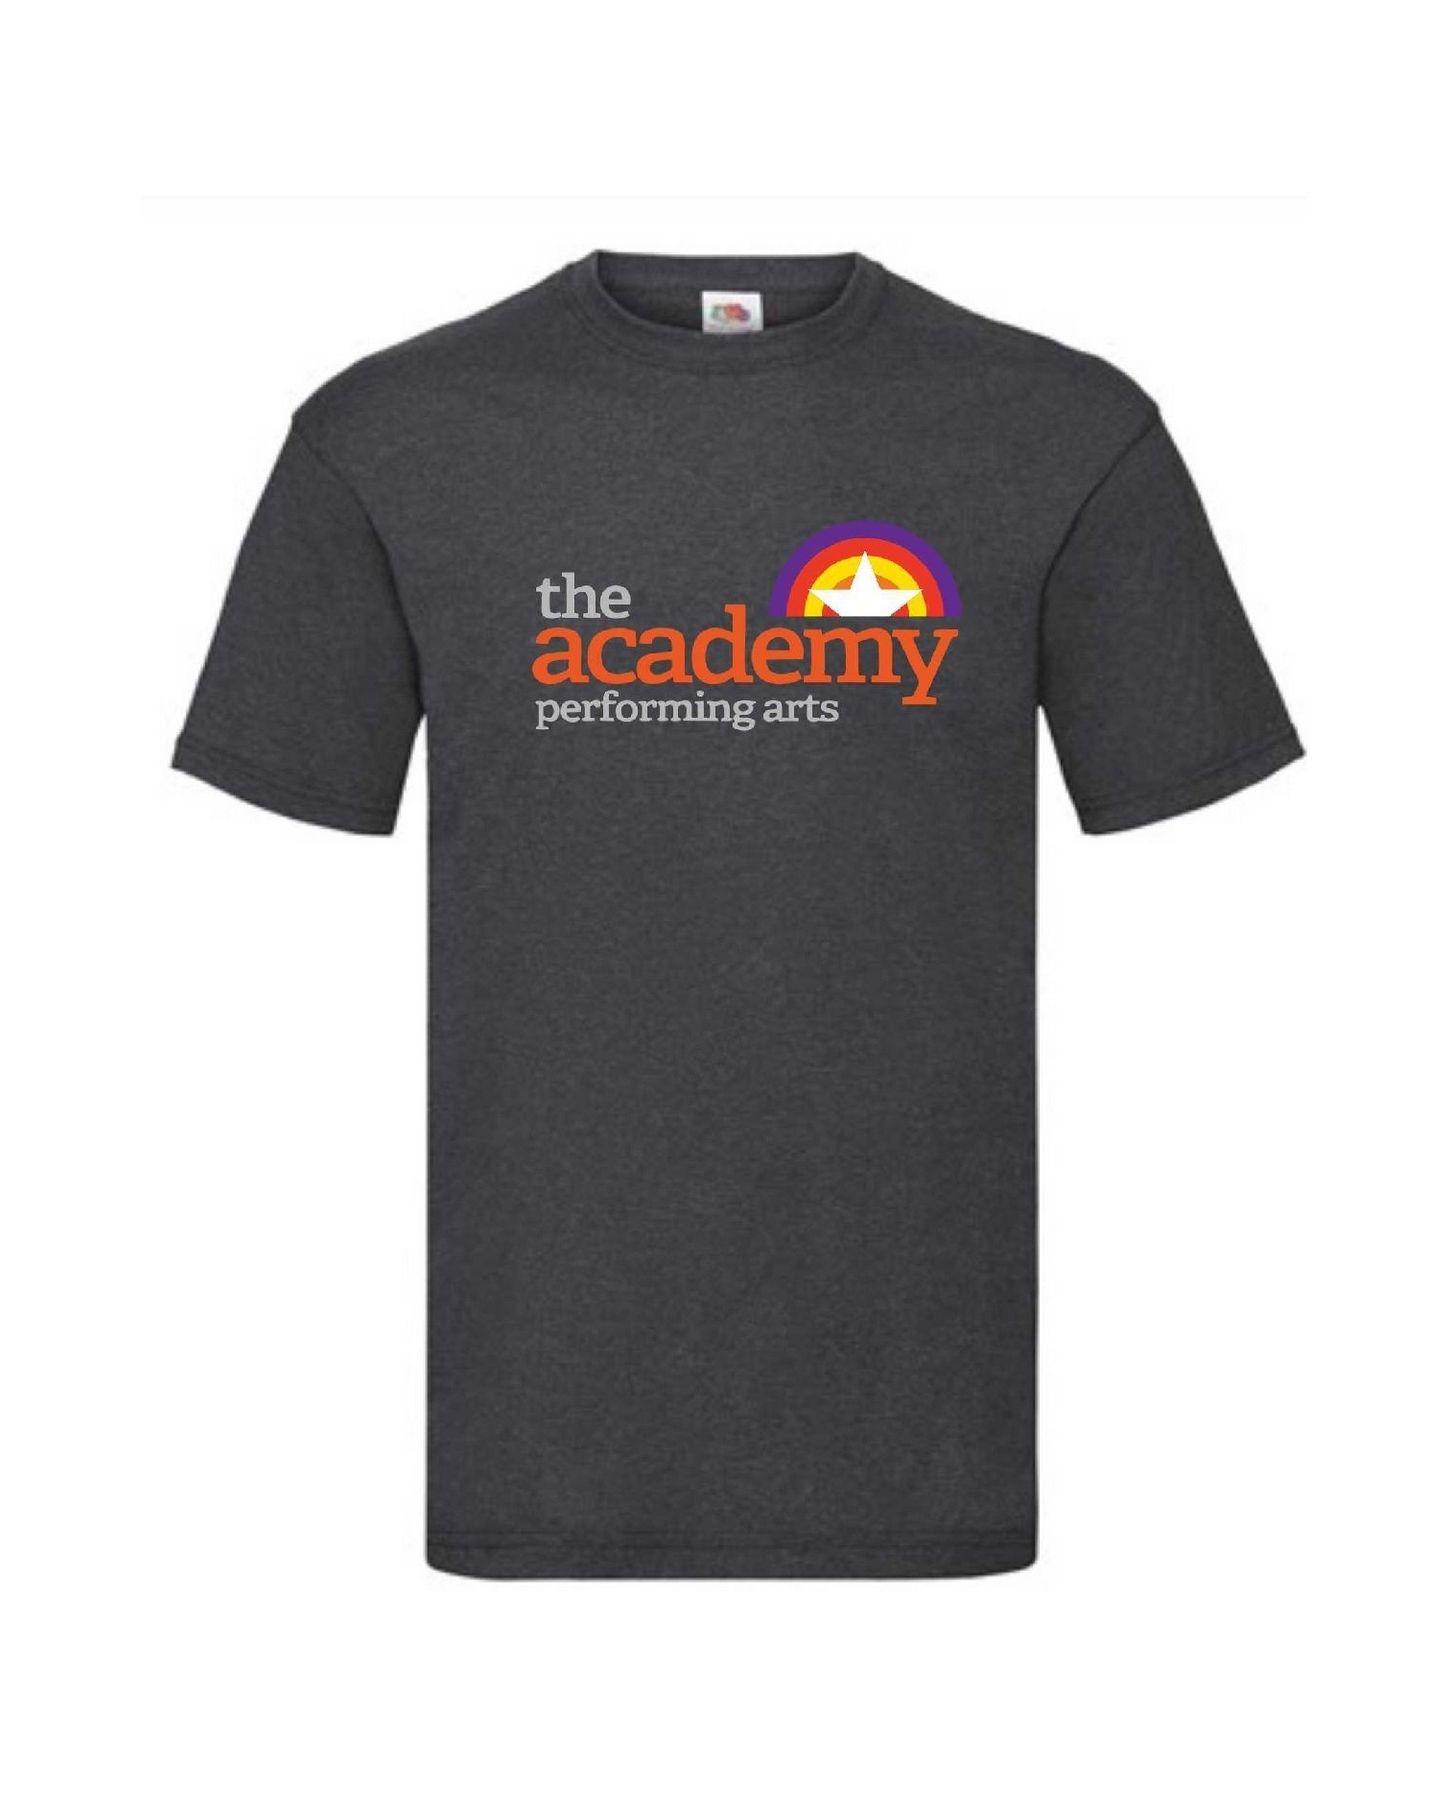 The Academy – Adults Tee